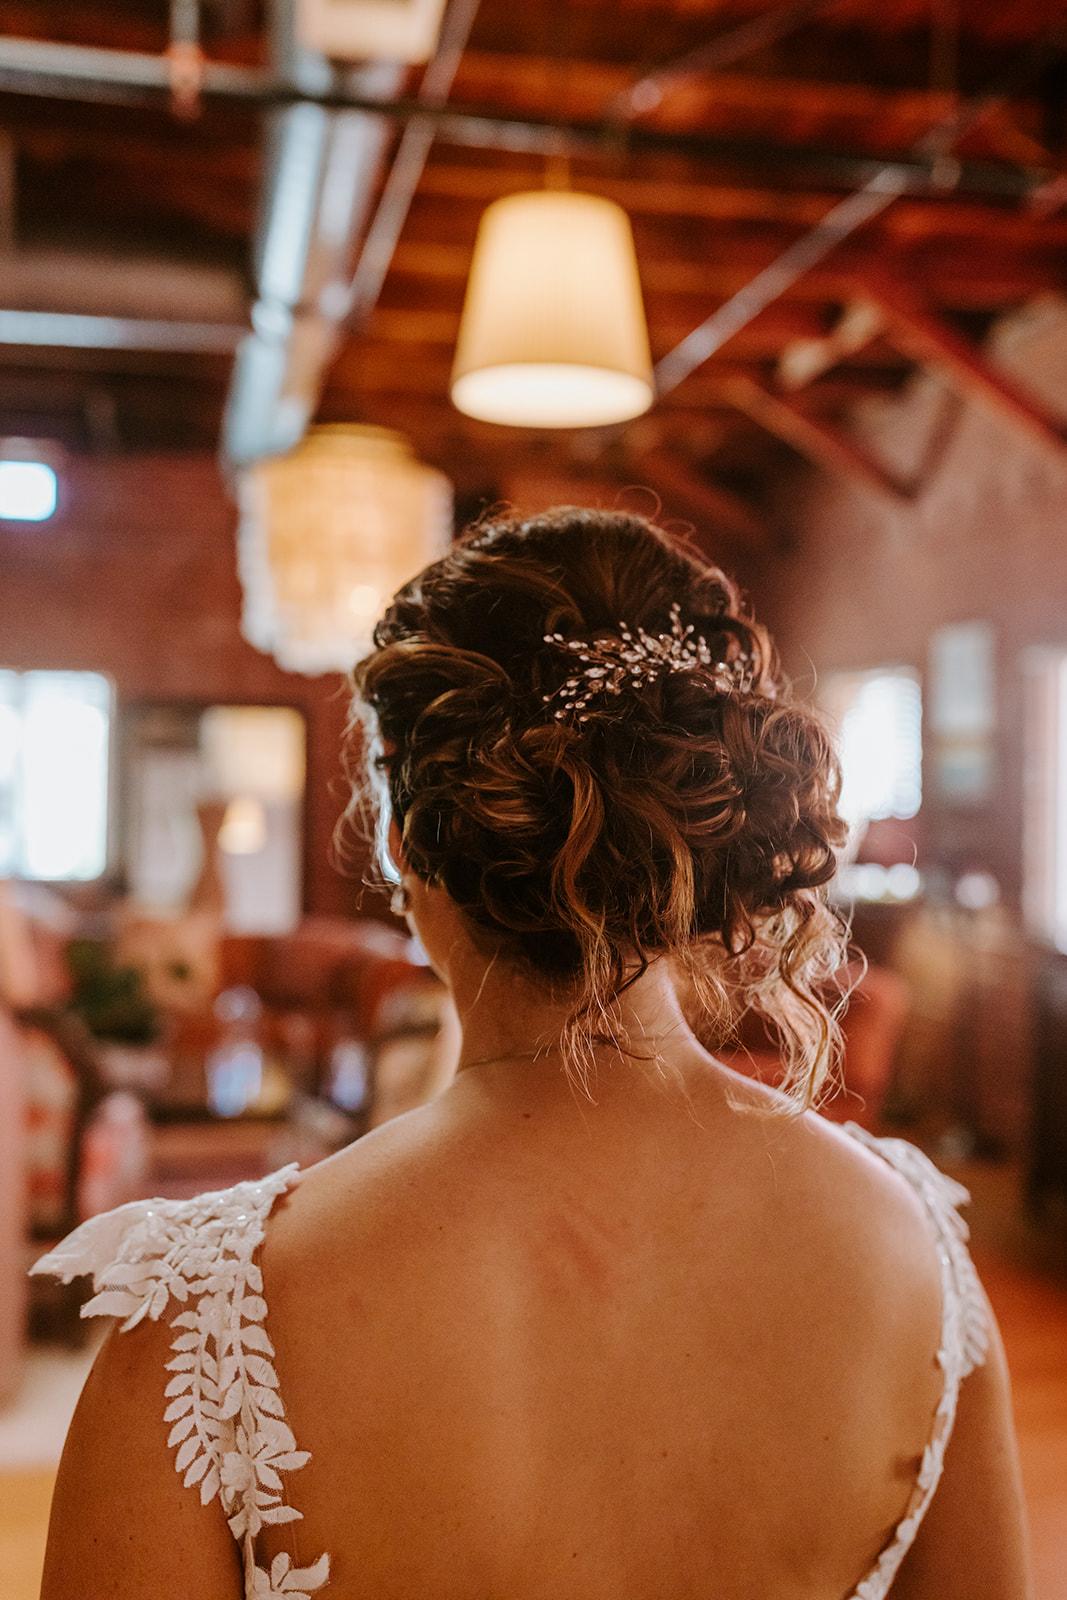 Loose romantic bun wedding hair | Carondelet House Wedding in Downtown Los Angeles | Los Angeles Wedding Photographer |Tida Svy Photography | www.tidasvy.com